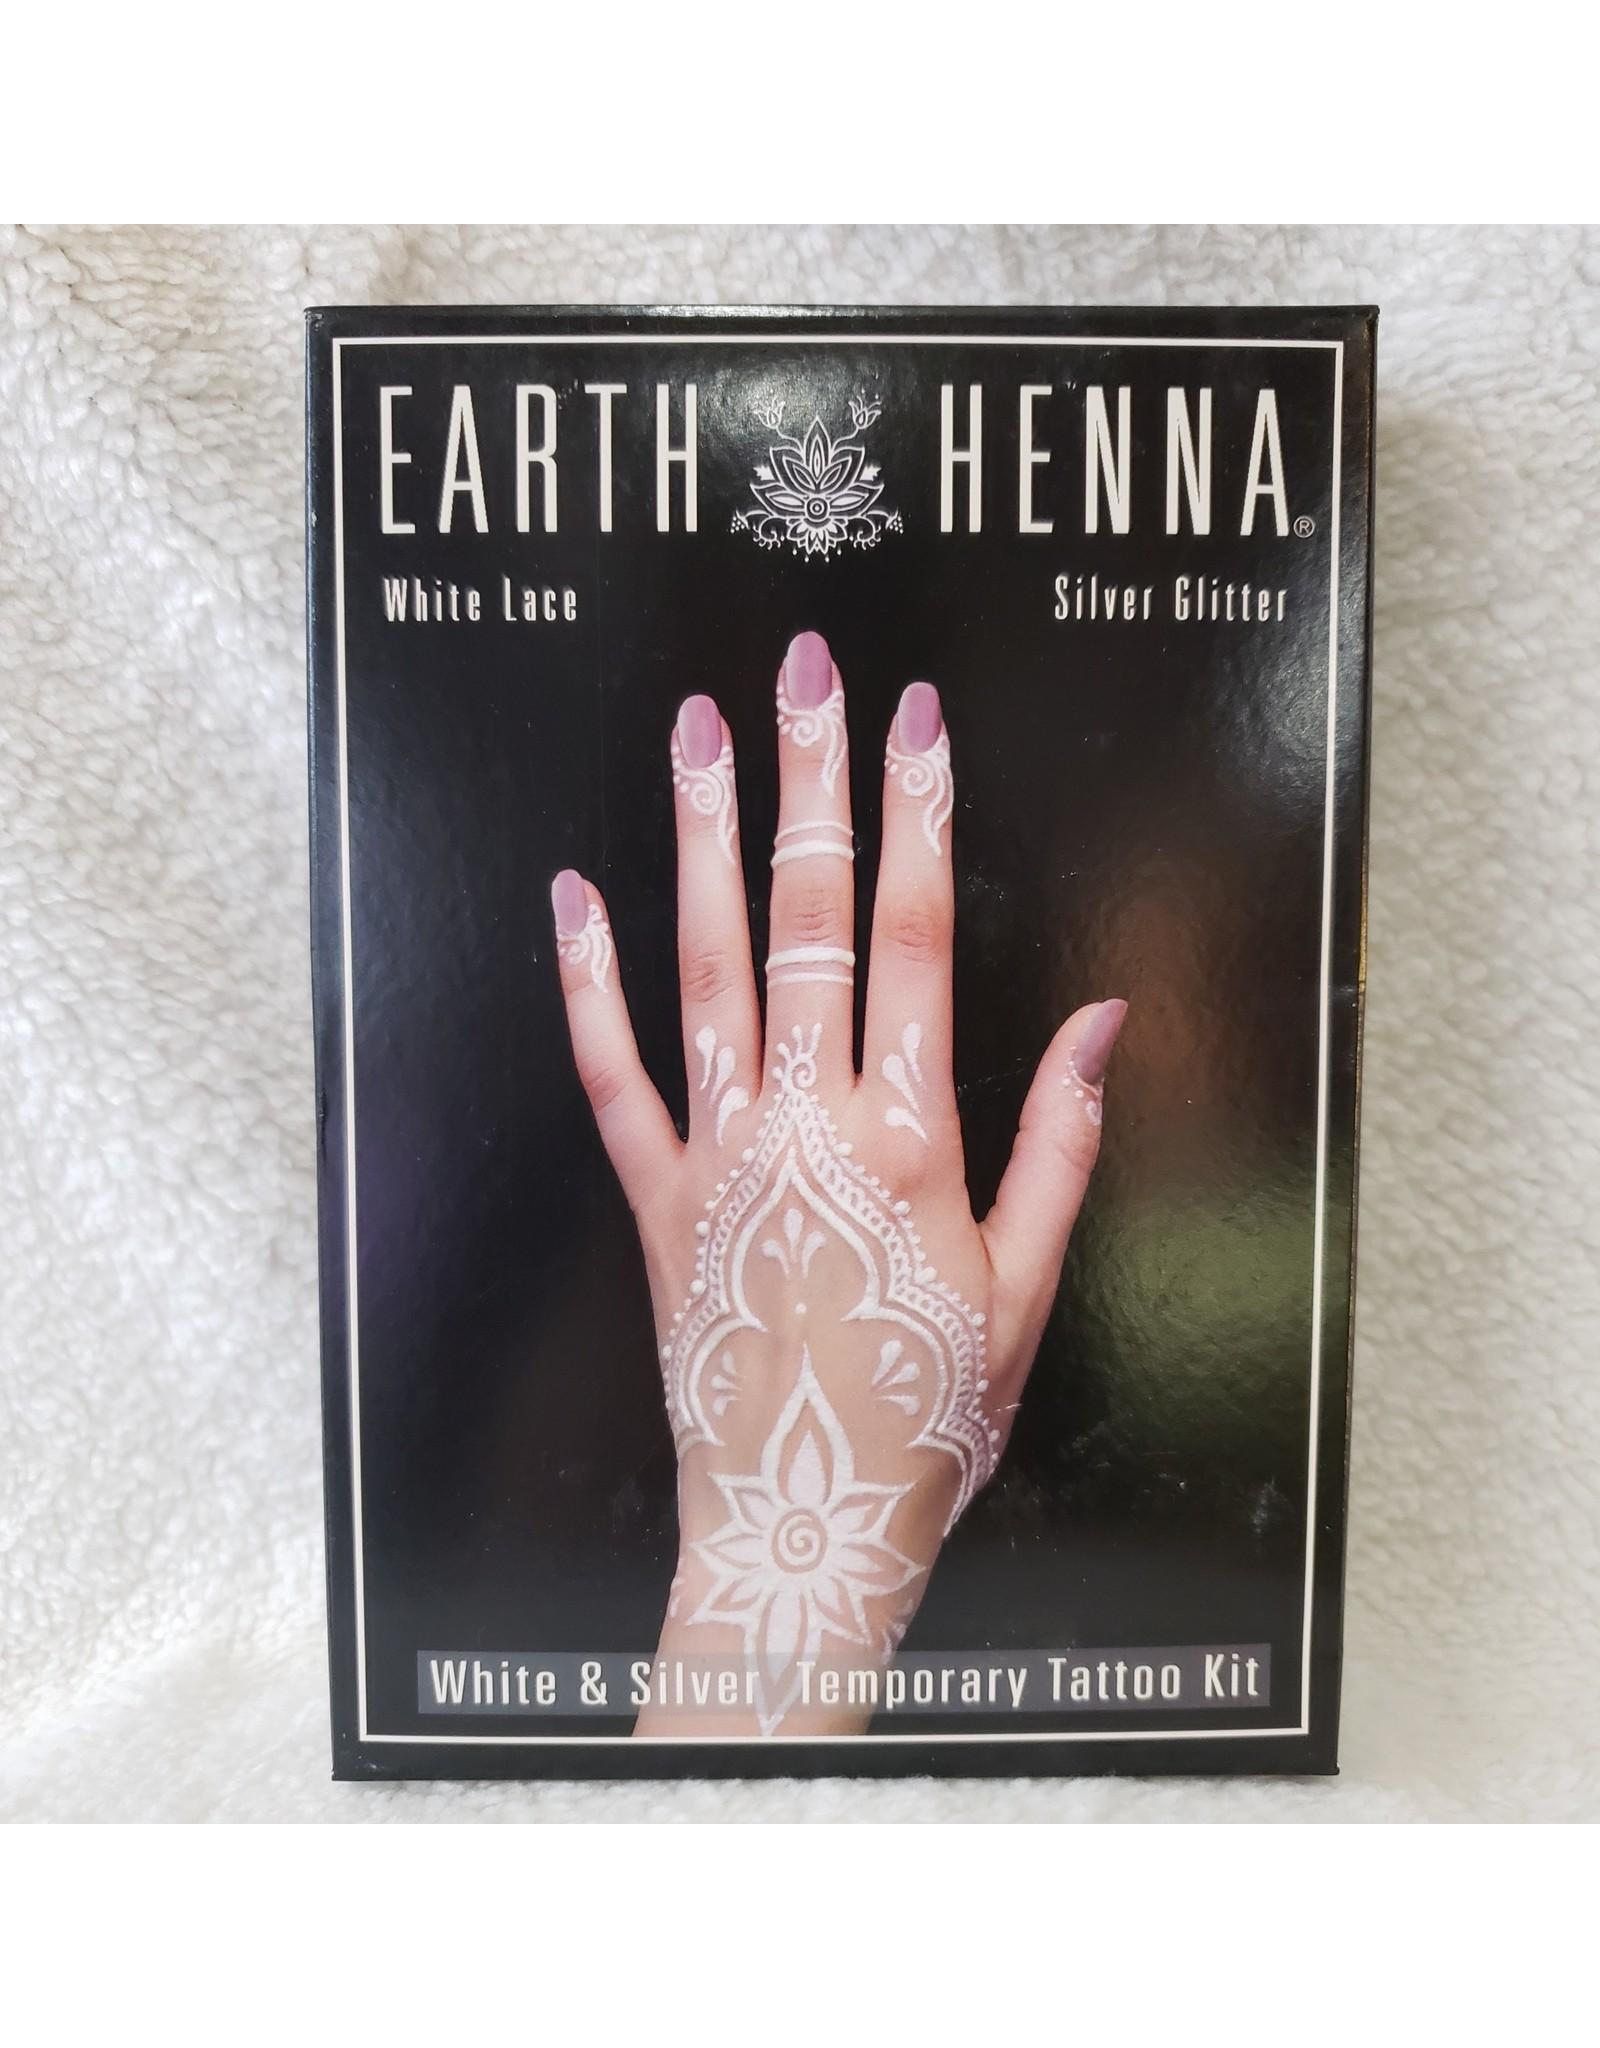 White Lace & Silver Henna Tattoo Kit